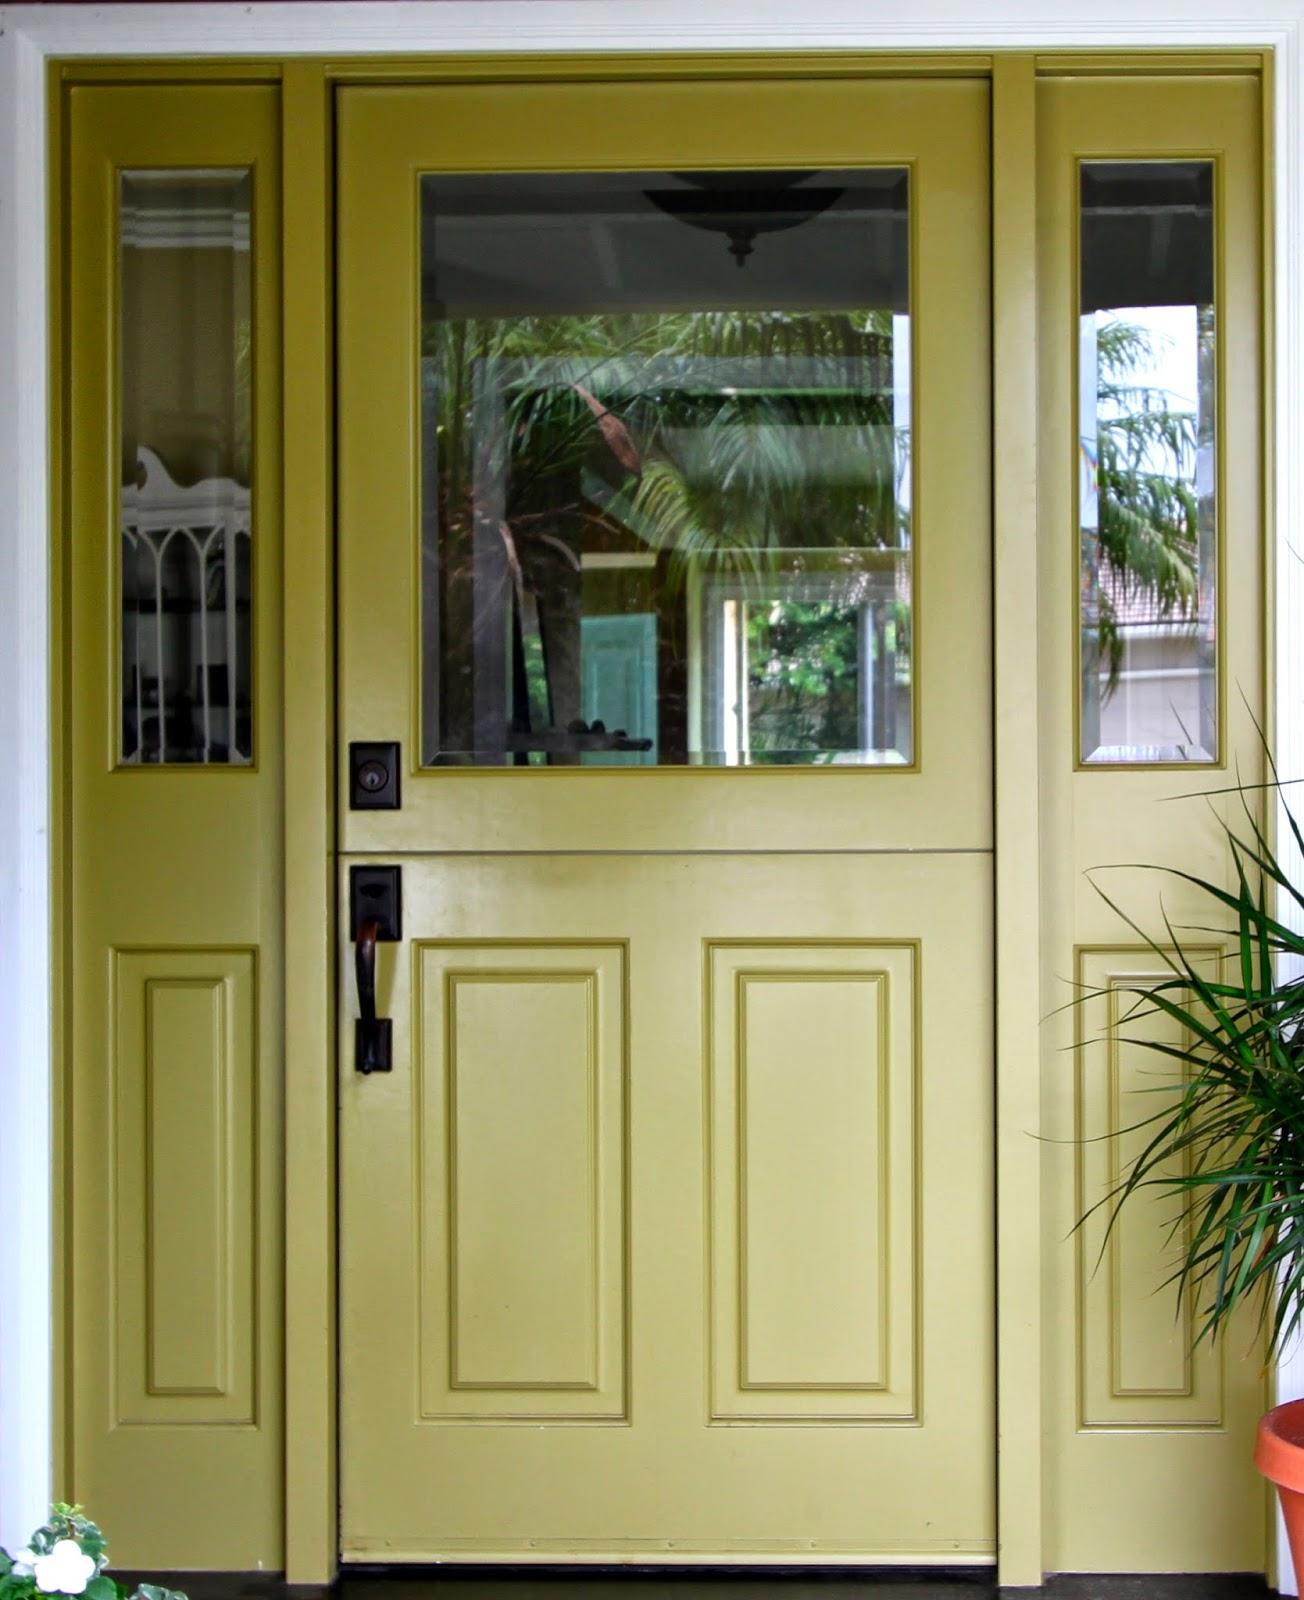 Sherri Cassara Designs: A few great doors colors